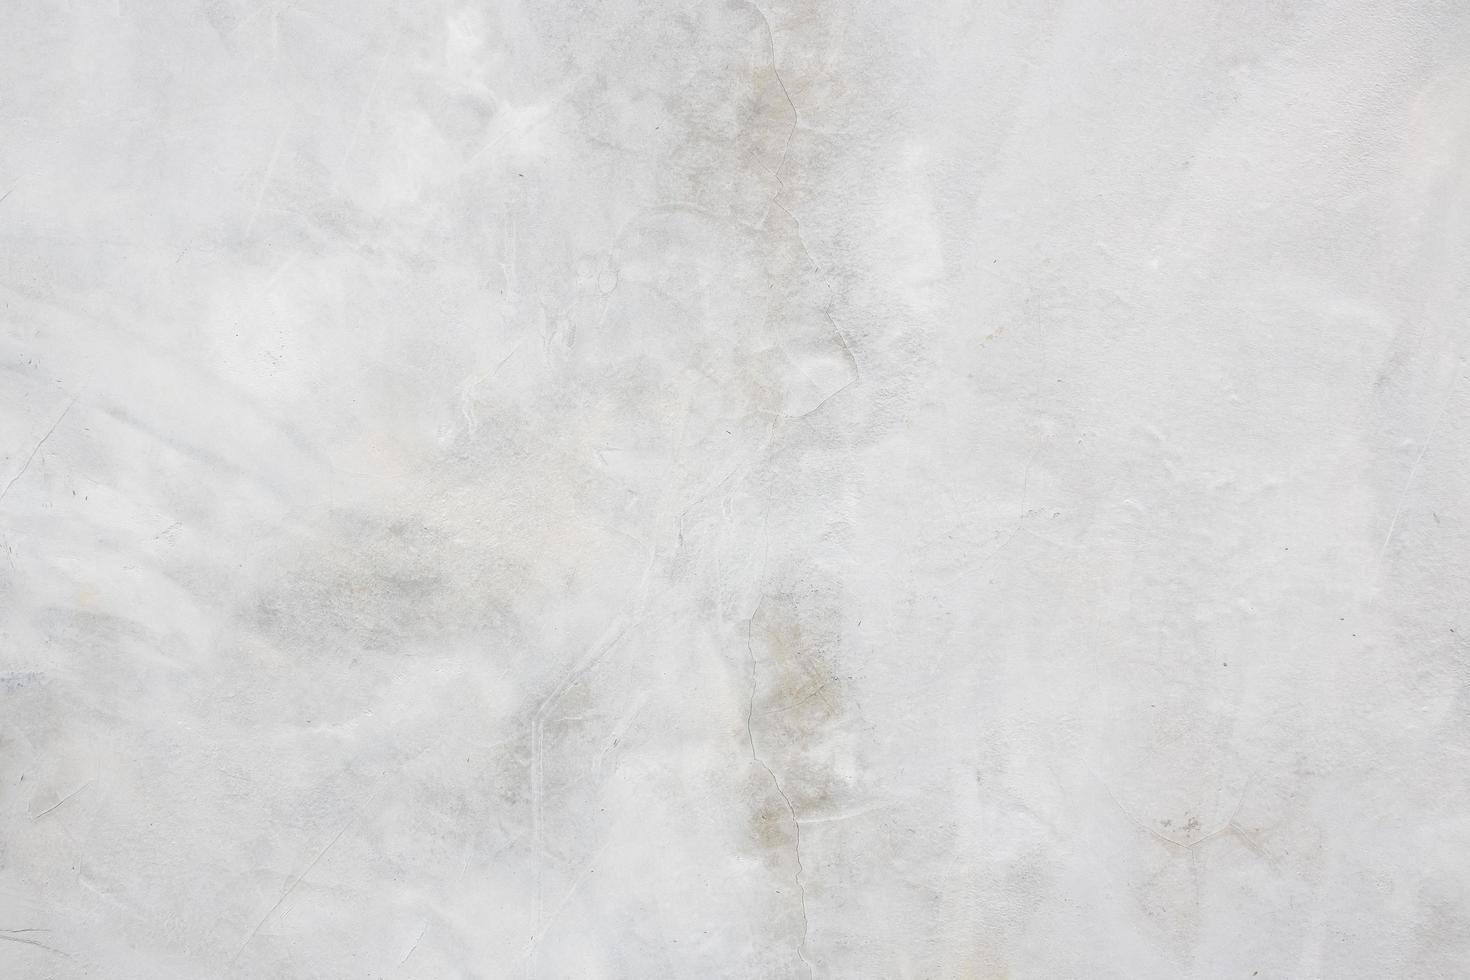 ljusgrå betongyta foto